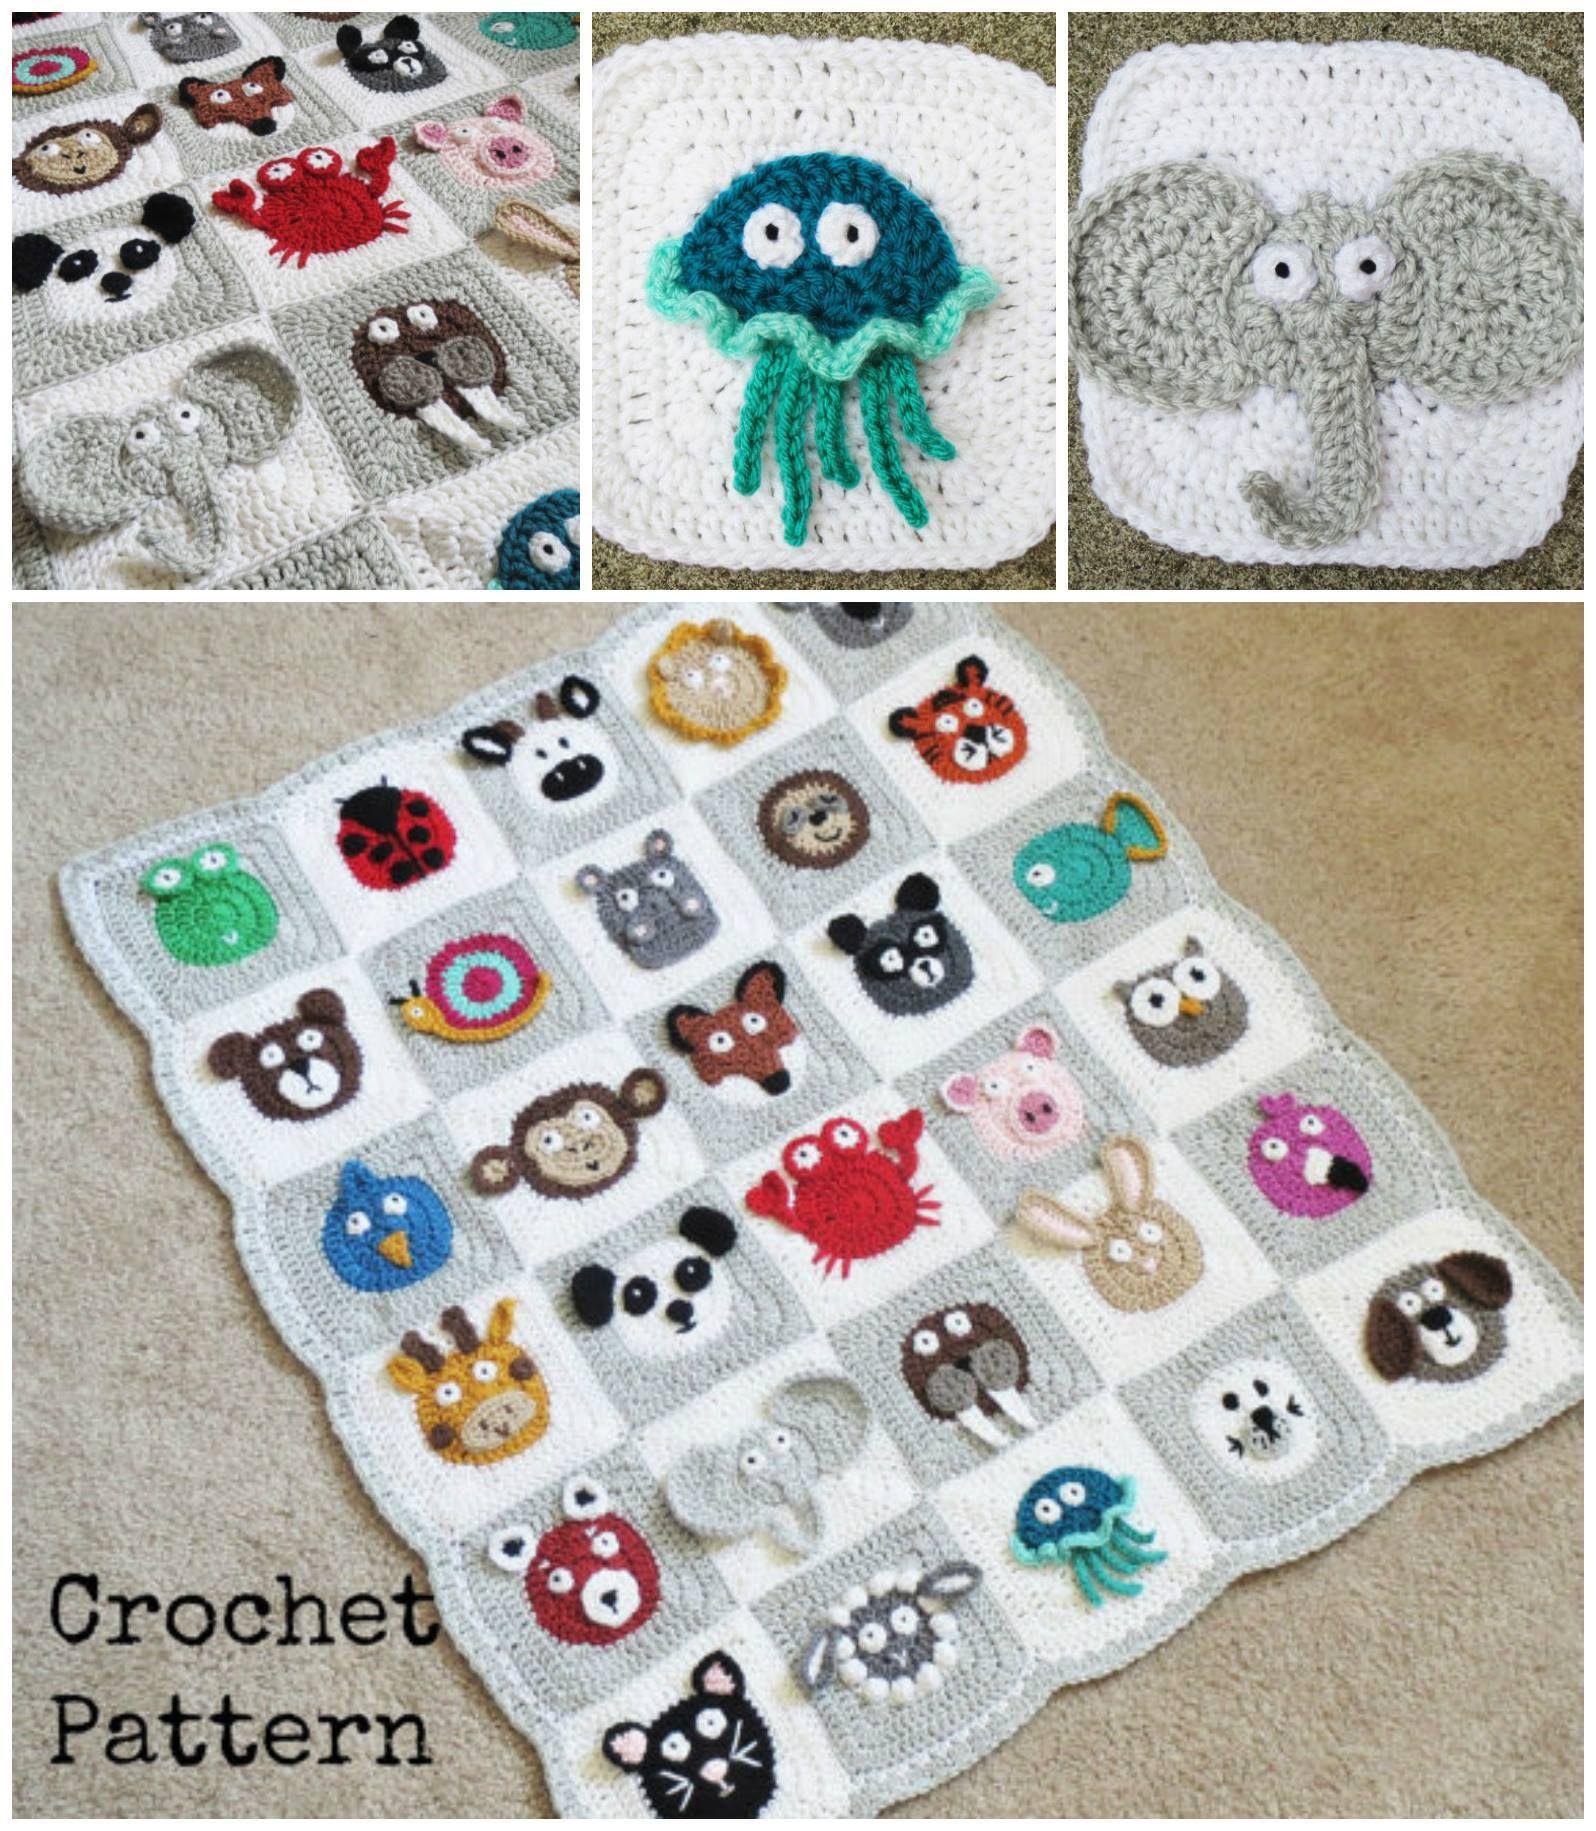 Crochet Zoo Baby Blanket Pattern Is Adorable   Patrones y Tejido